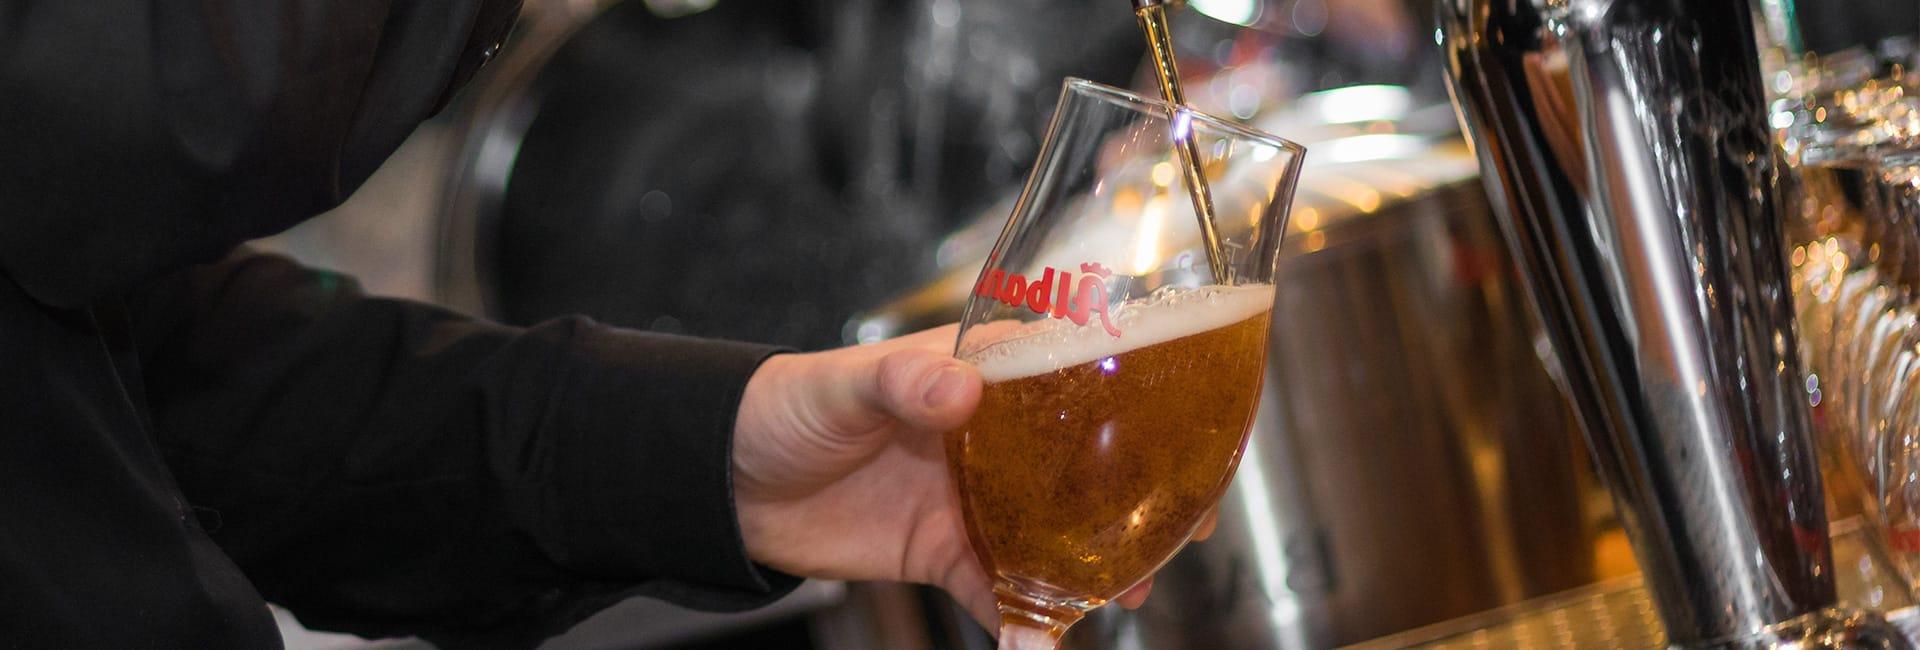 Julefrokost øl på fad hos Roskilde Bowling Center